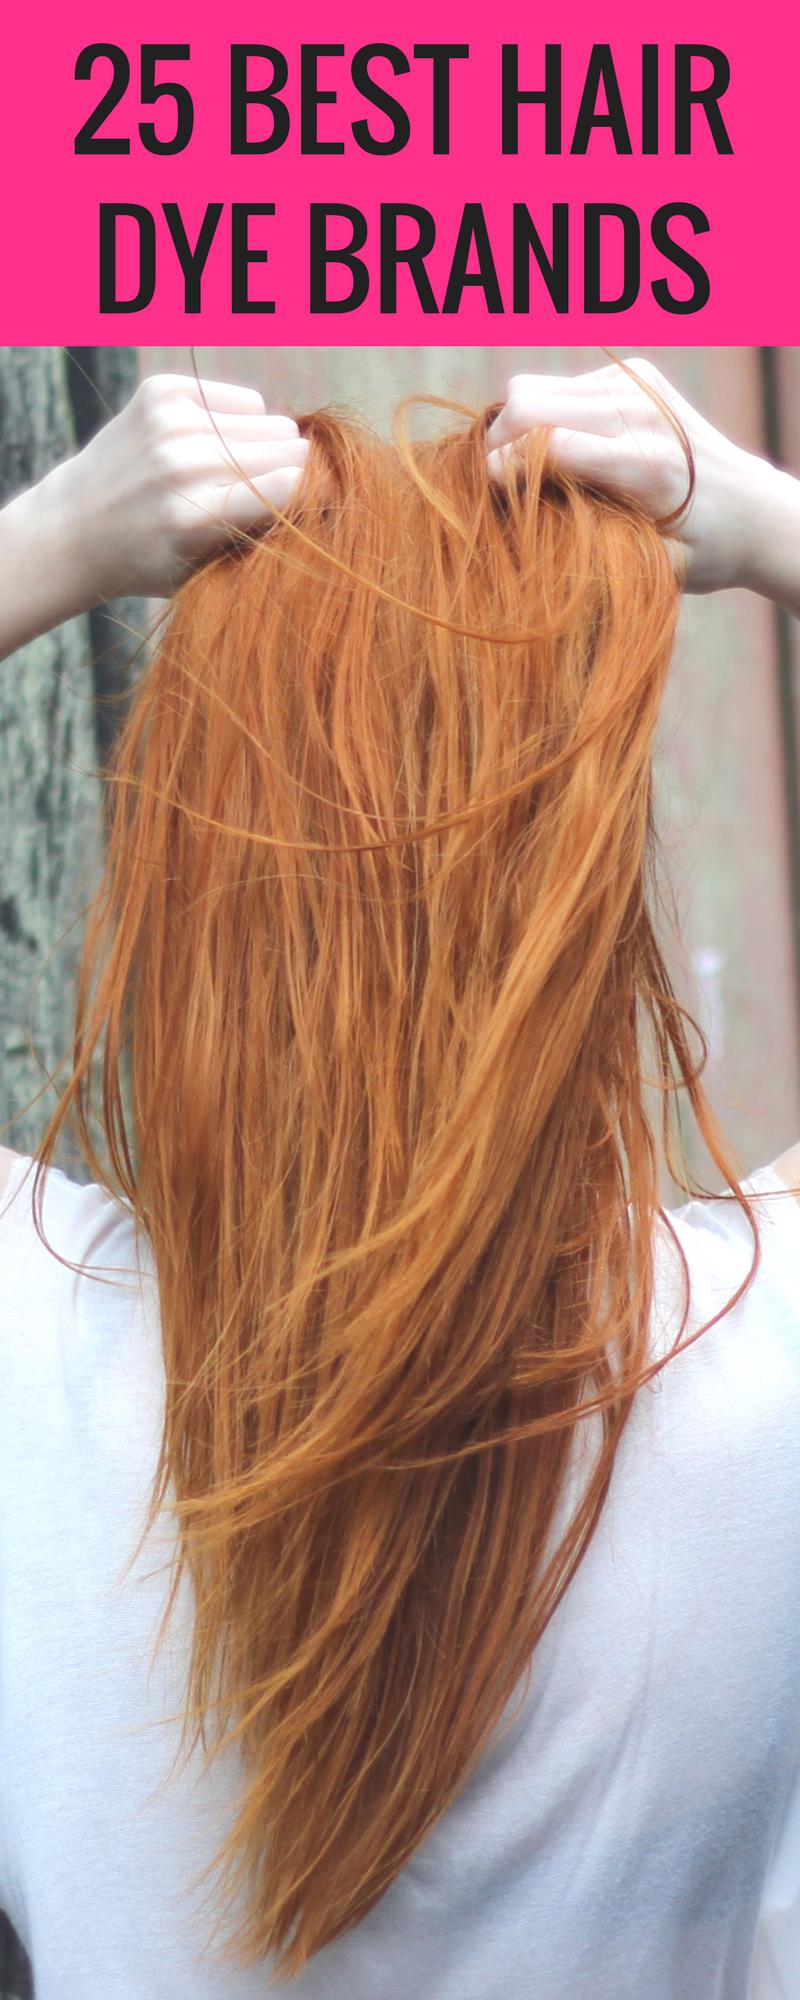 The Best Hair Dye Brands | Pinterest | Hair dye brands, Hair dye and ...